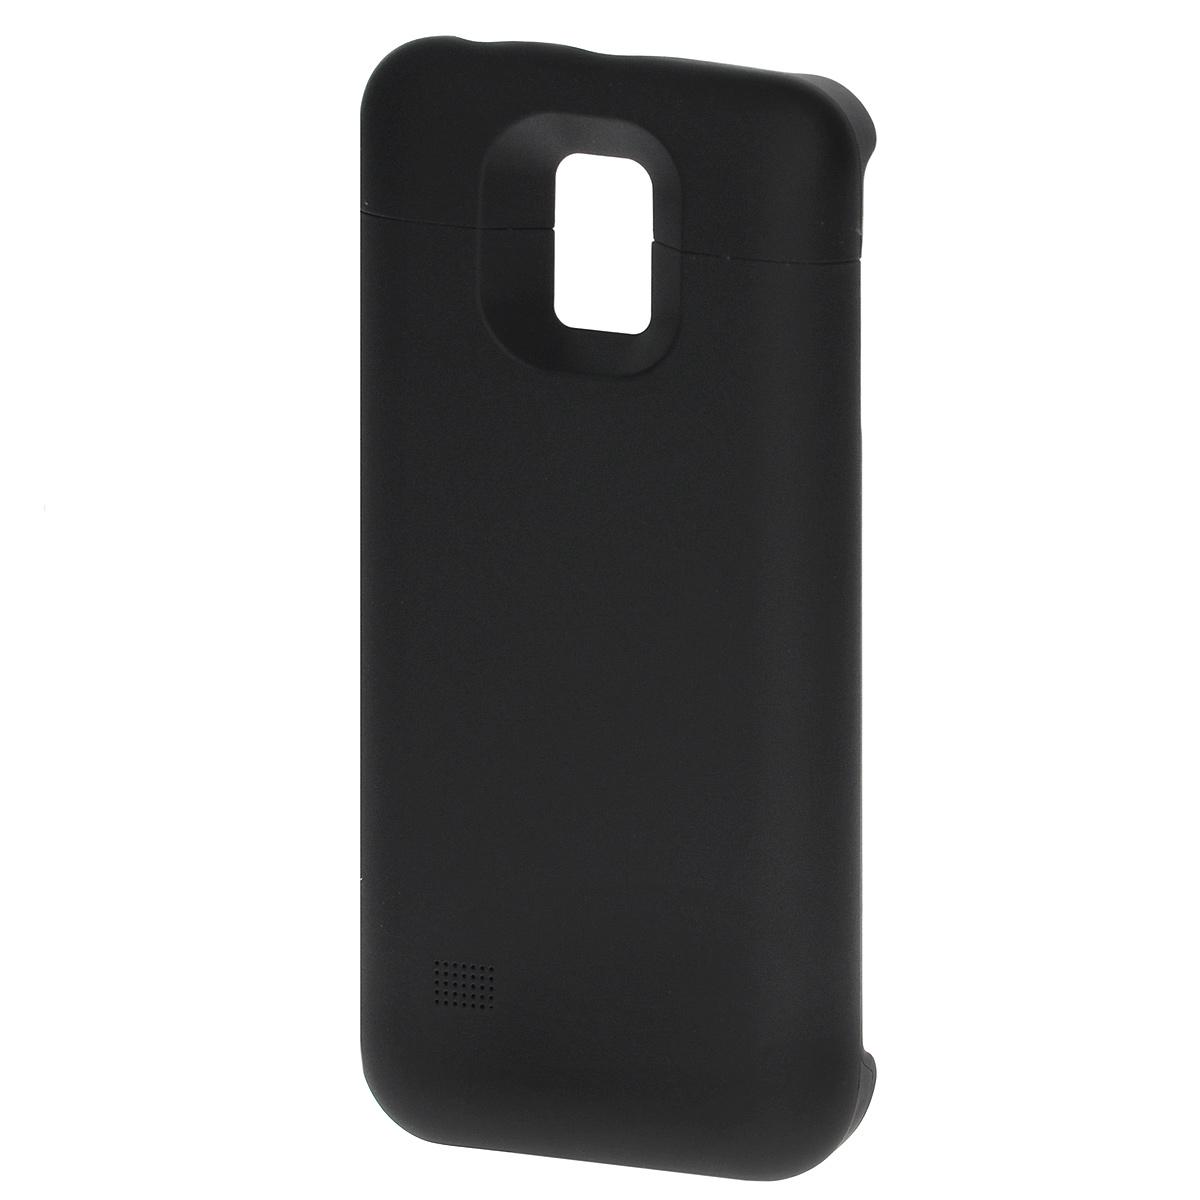 EXEQ HelpinG-SC09 чехол-аккумулятор для Samsung Galaxy S5 mini, Black (3300 мАч, клип-кейс) холодильник indesit ef 16 d двухкамерный белый